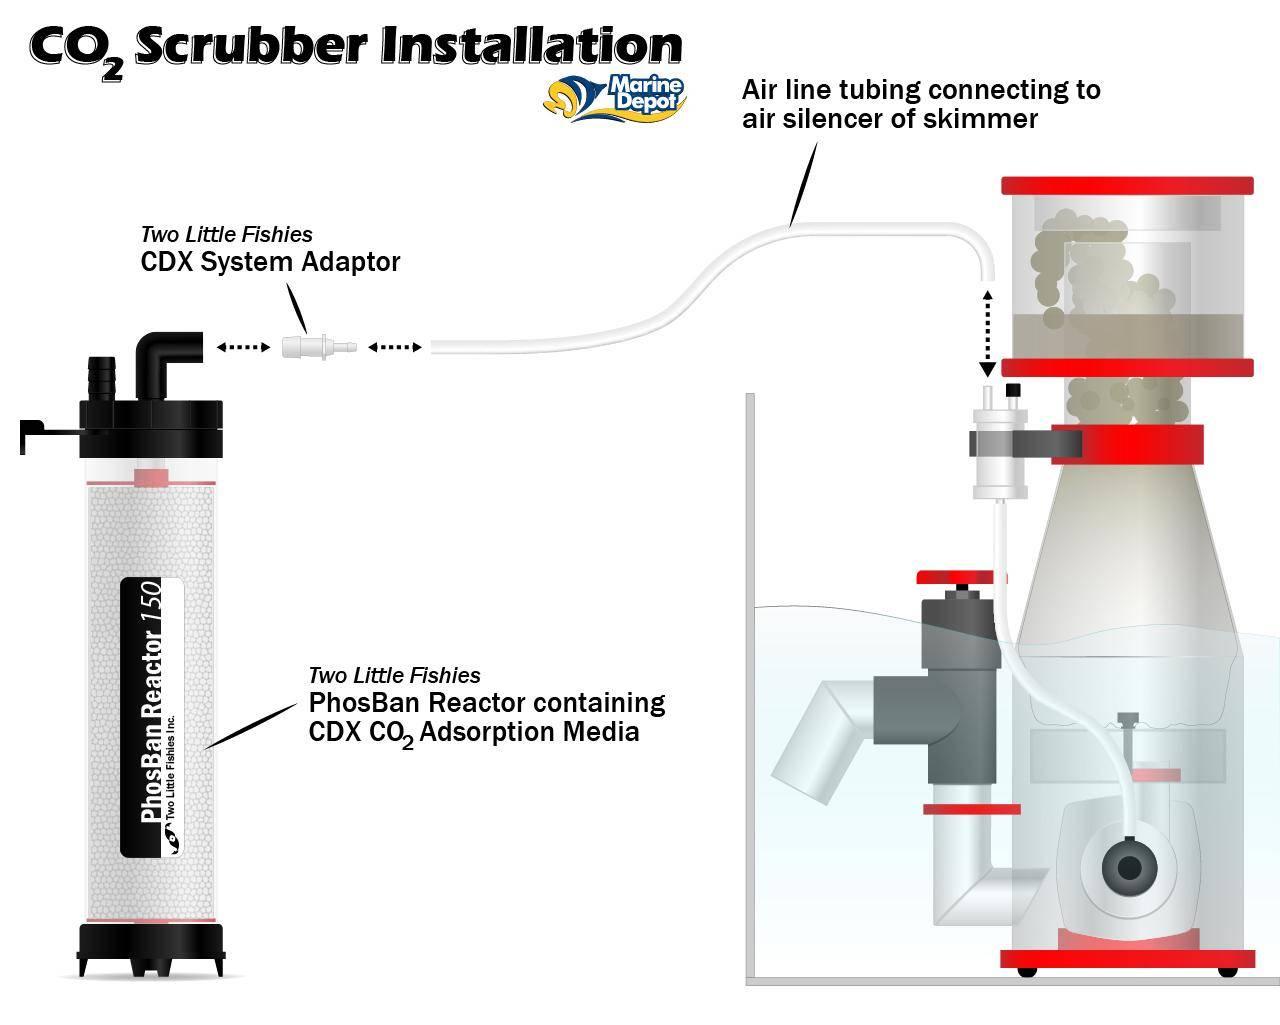 Installation diagram of a CO2 scrubber to raise pH